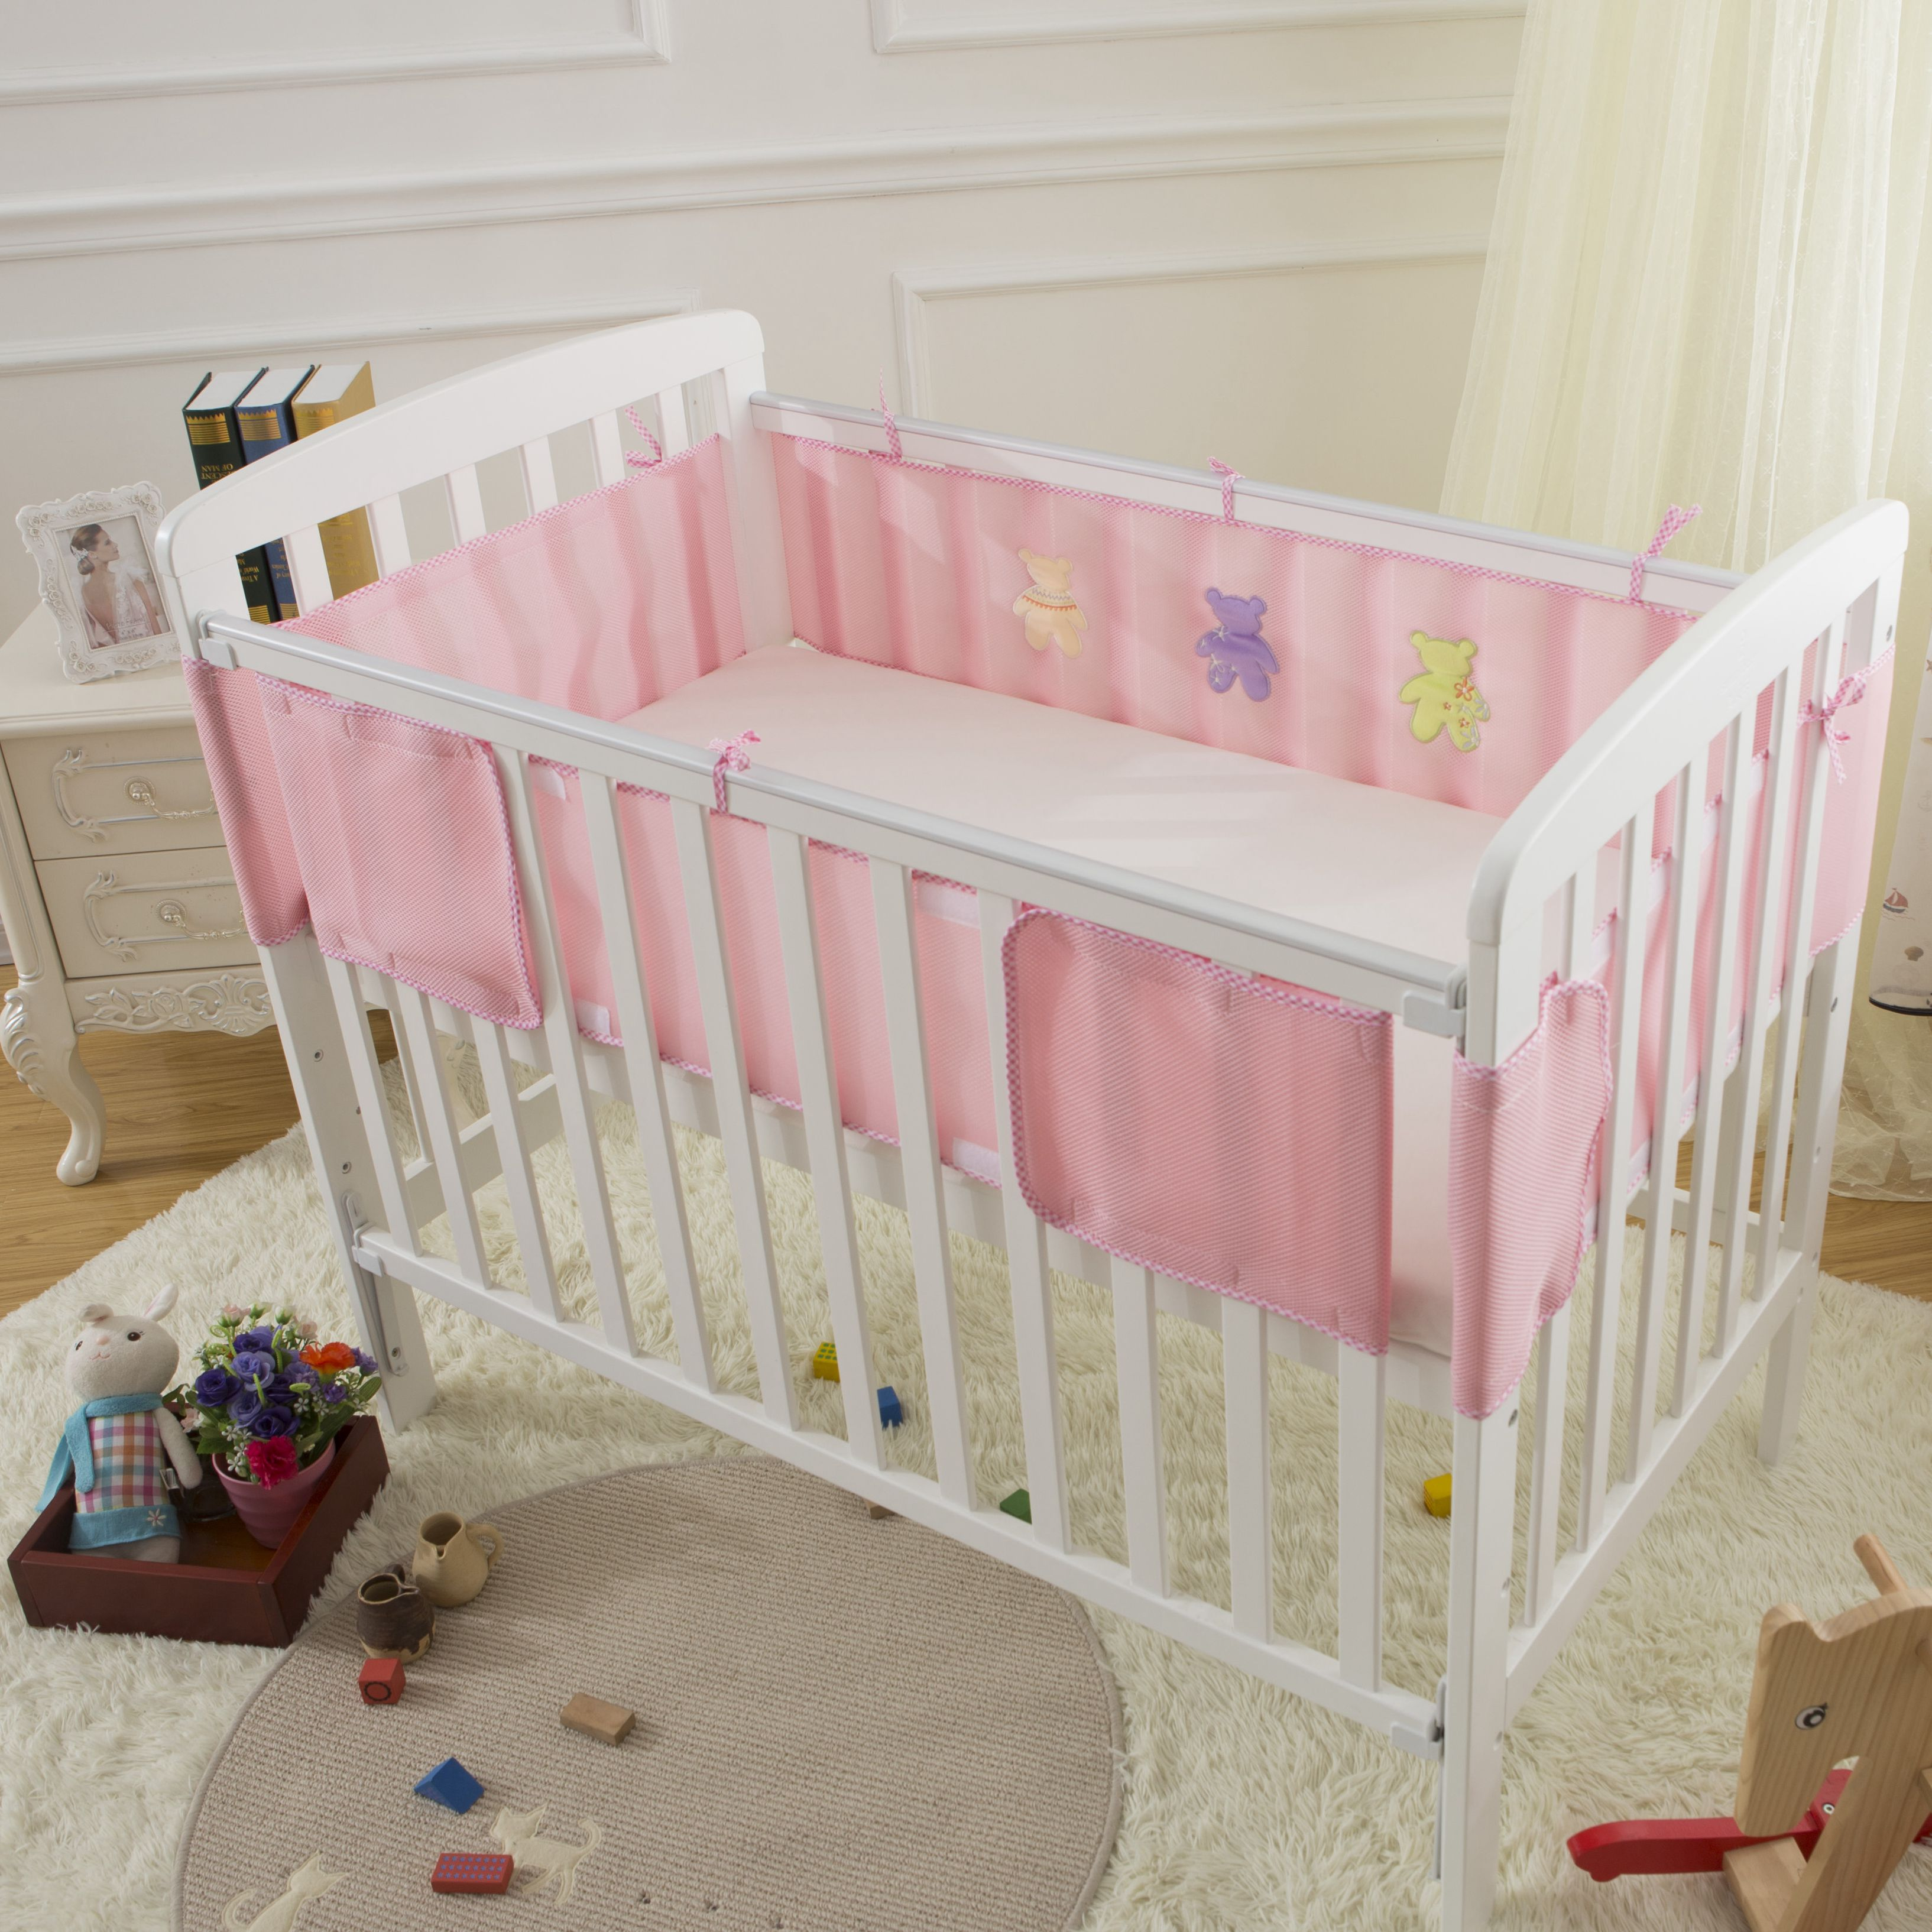 Bumper for crib for sale - Muslin Life 2pcs Set Cartoon Printed 3d Mesh Newborn Infant Bed Bumper Baby Crib Around